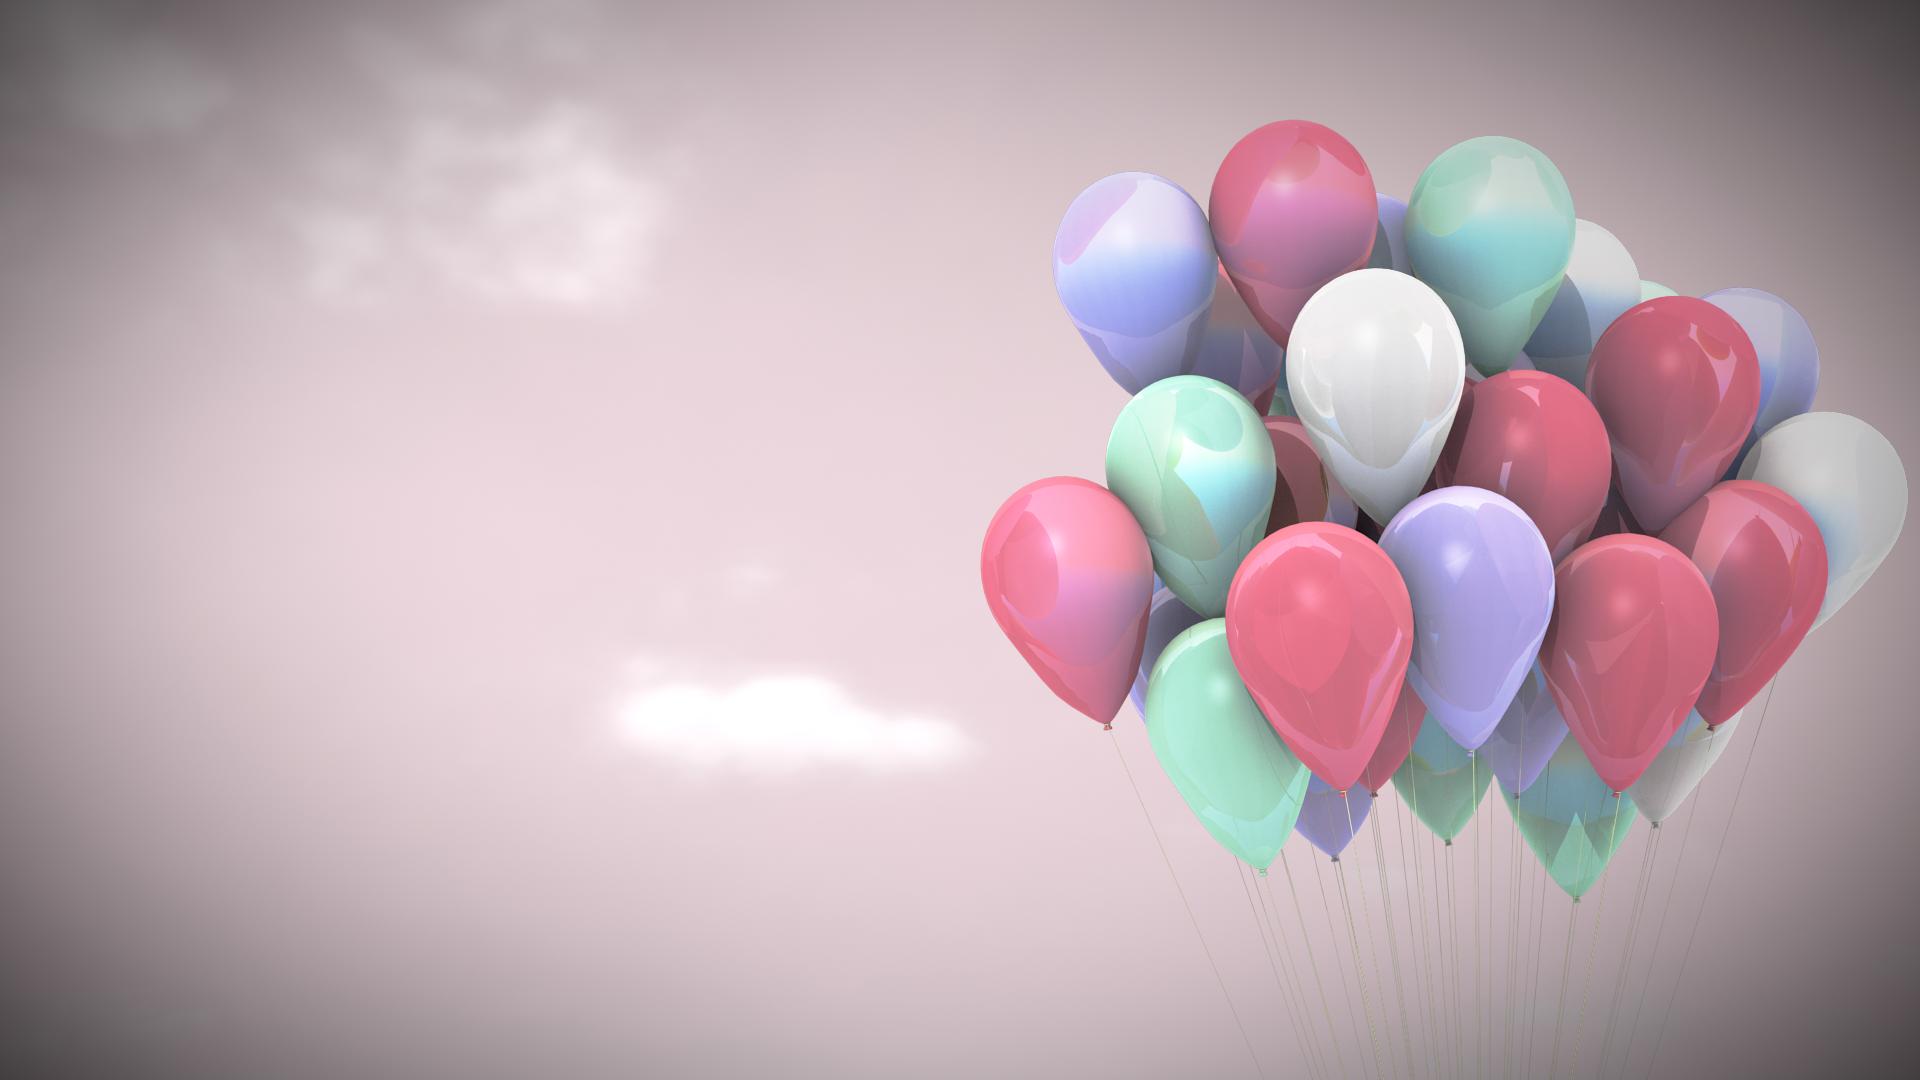 vintage balloons in the sky wwwpixsharkcom images